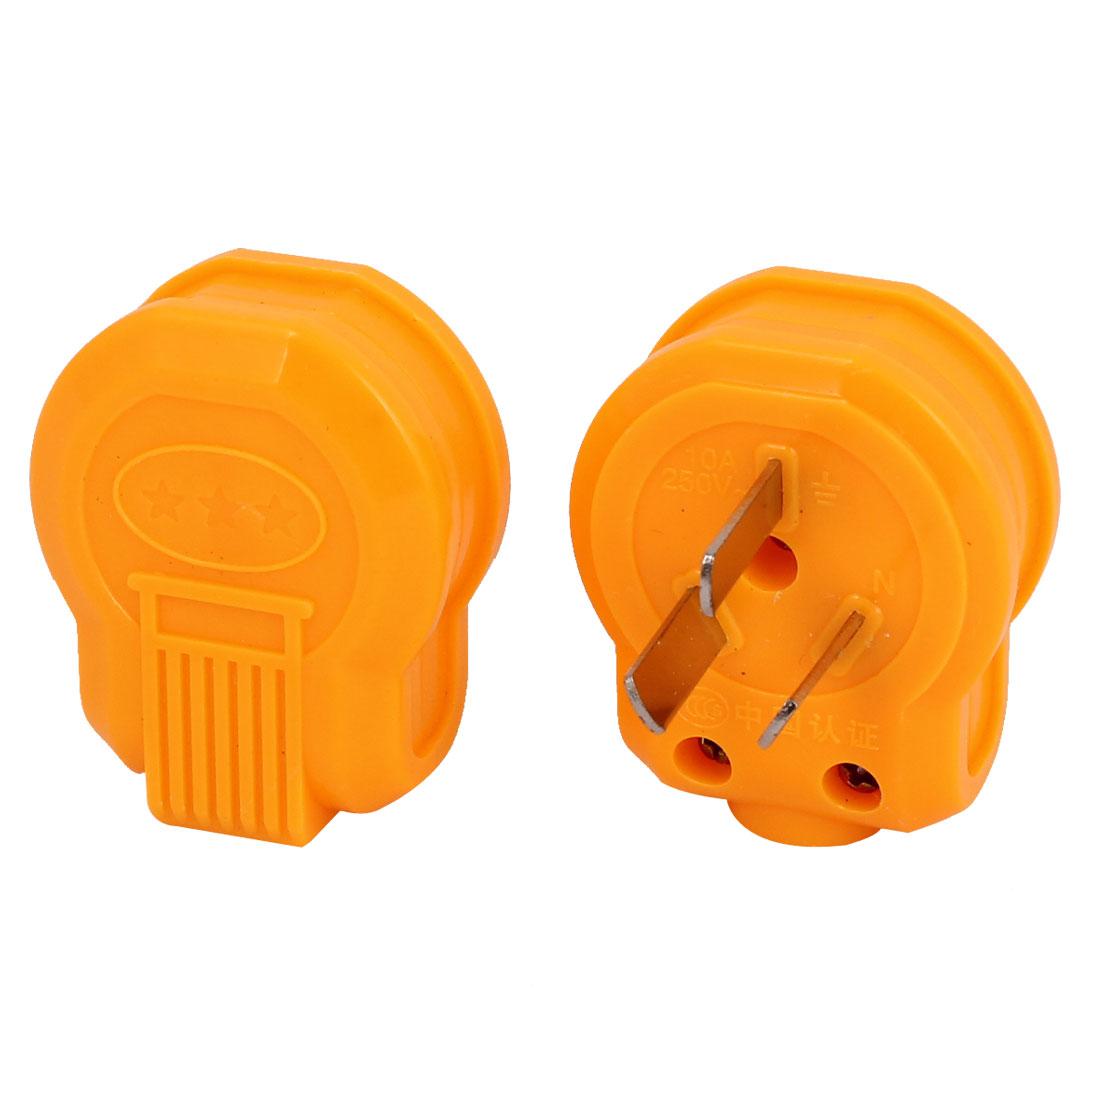 2 Pcs Orange Plastic Housing 3 Flat Pin AU Plug Power Connector AC 250V 10A